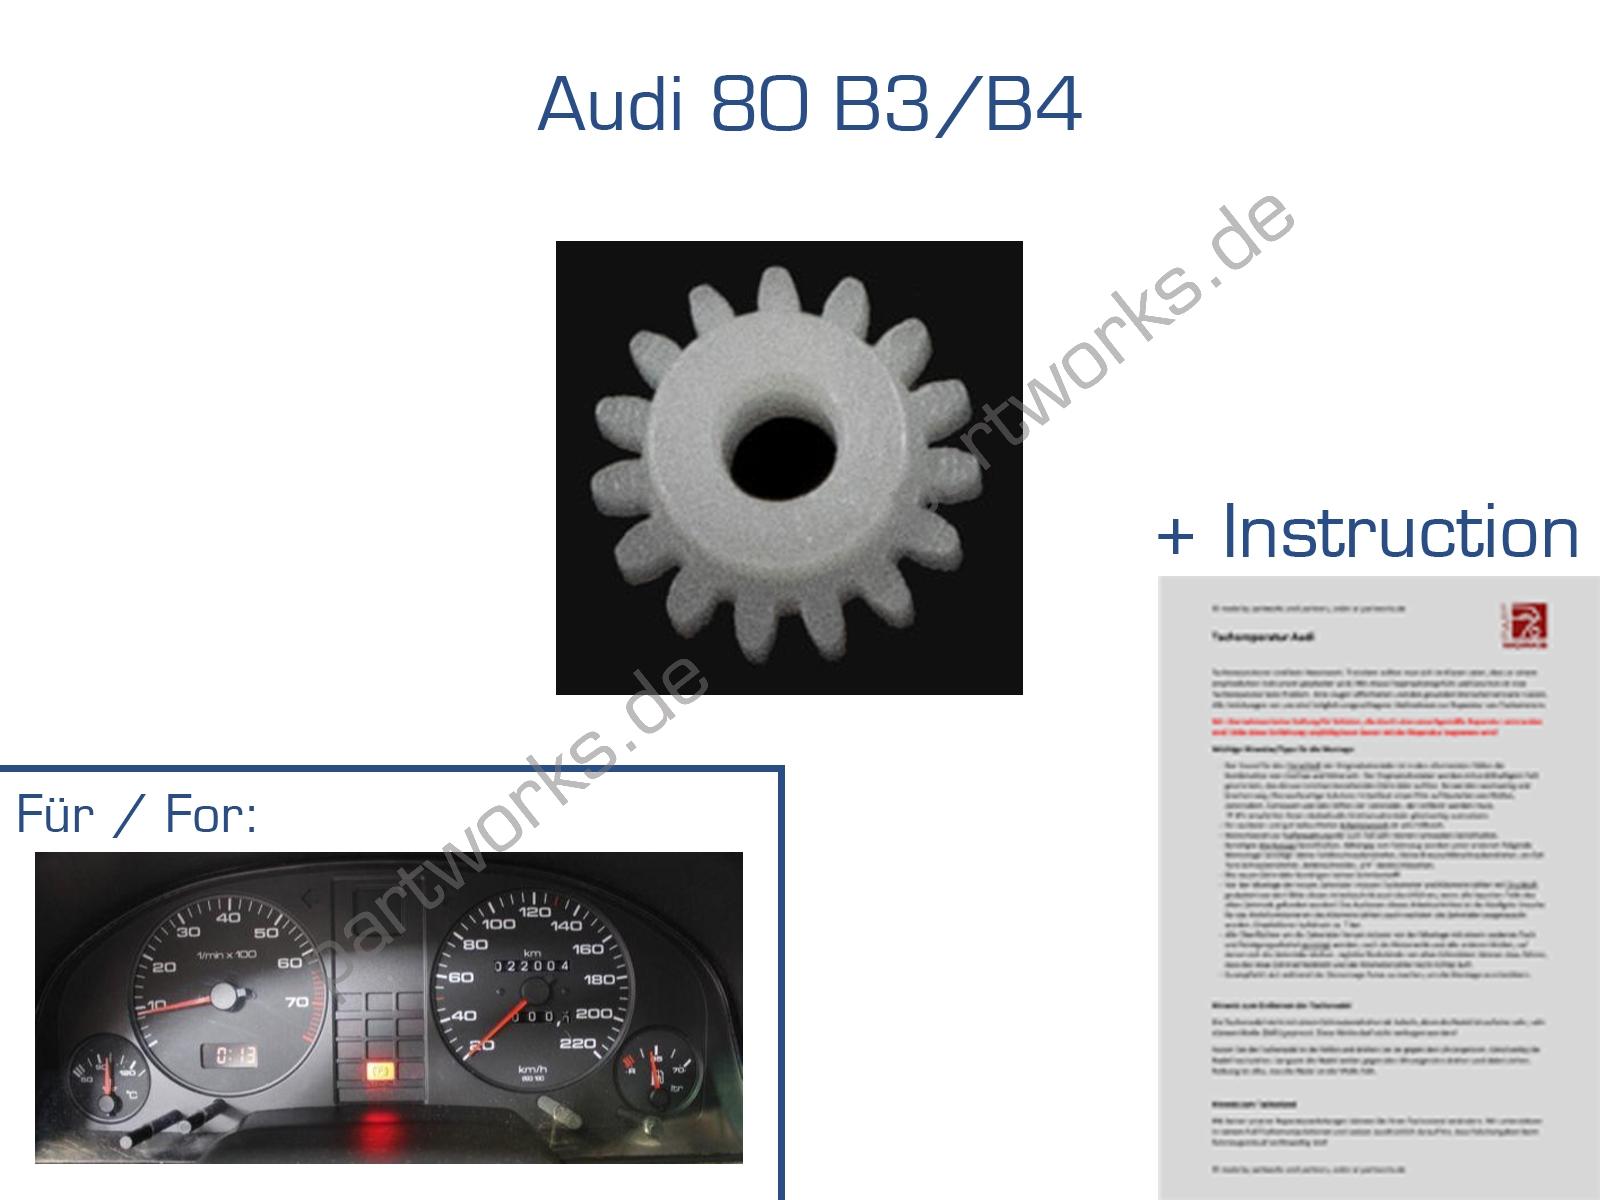 E15 Zahnrad für Audi 80 B3/B4 Tacho Kilometerzähler Reparatur